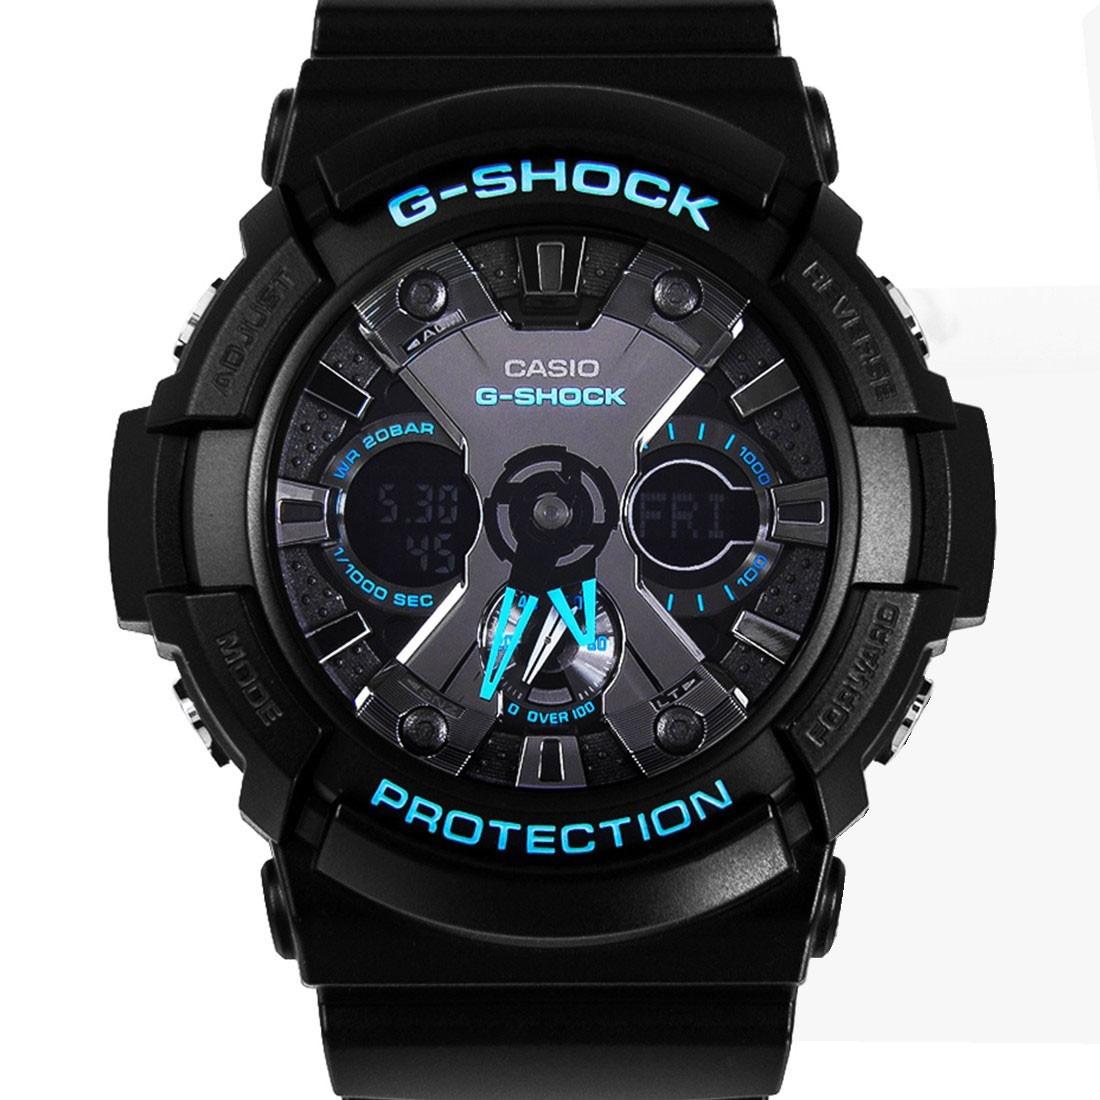 501d8653581 g shock esportivo 5 alarmes cronômetro a prova dágua 20atm. Carregando zoom.